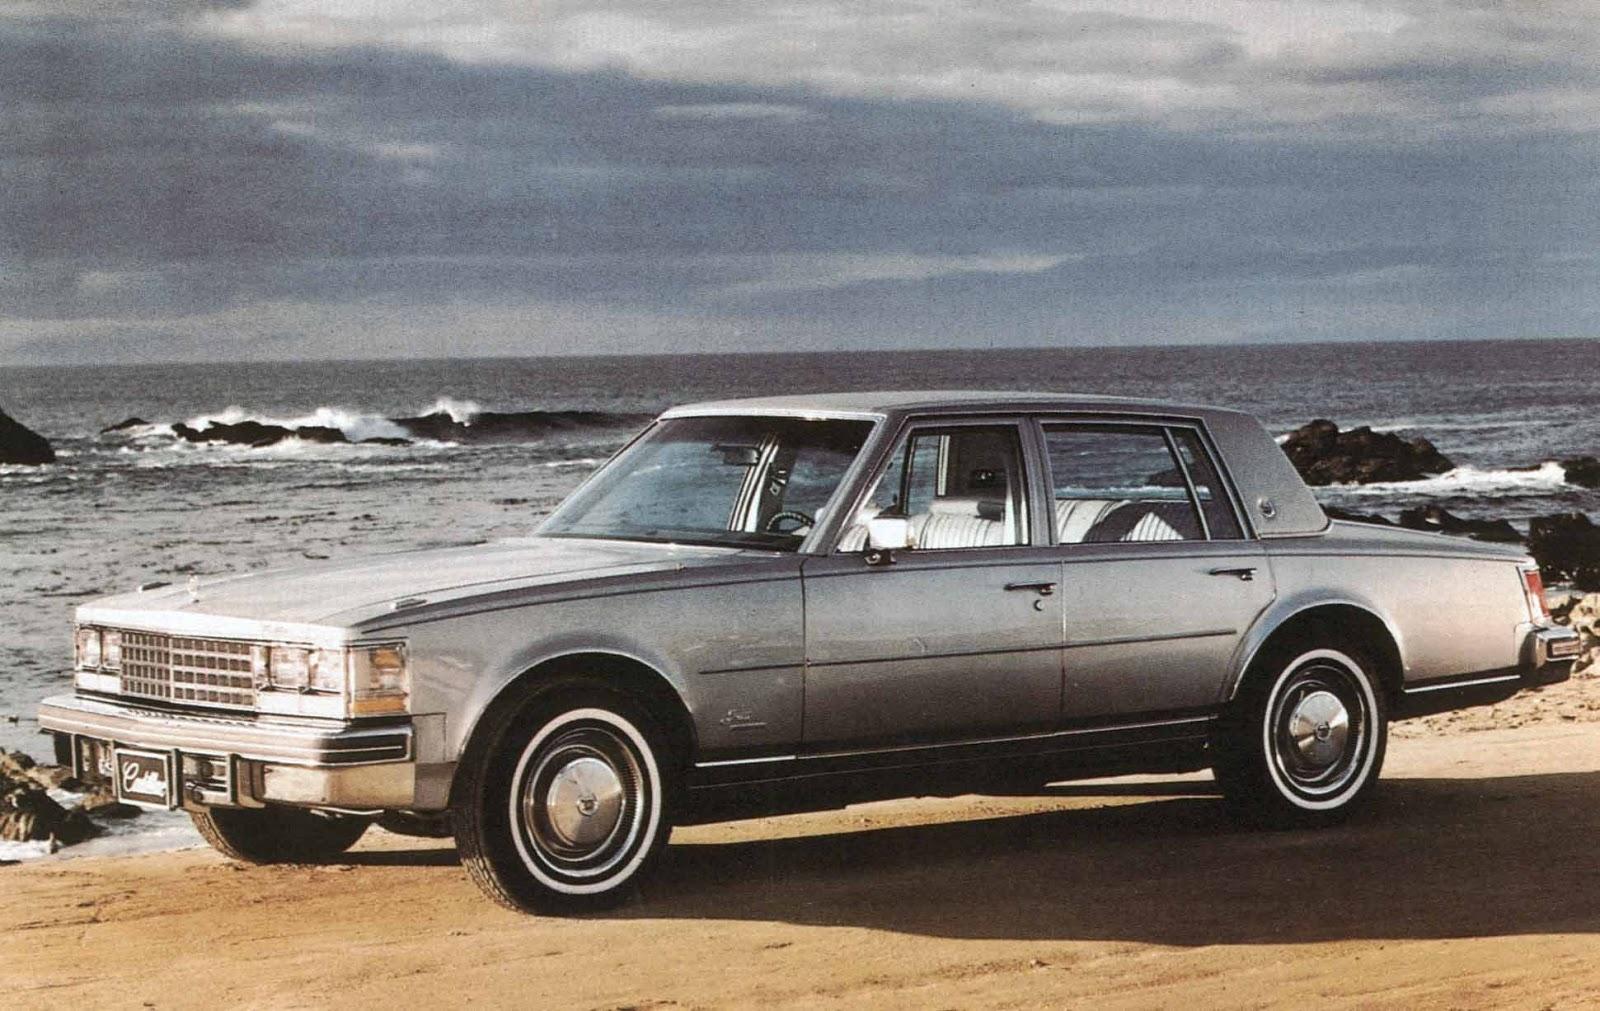 1978 Cadillac Seville Vinyl Top Sedan Deville 4 Door Changing The Luxury Car Game 1600x1011